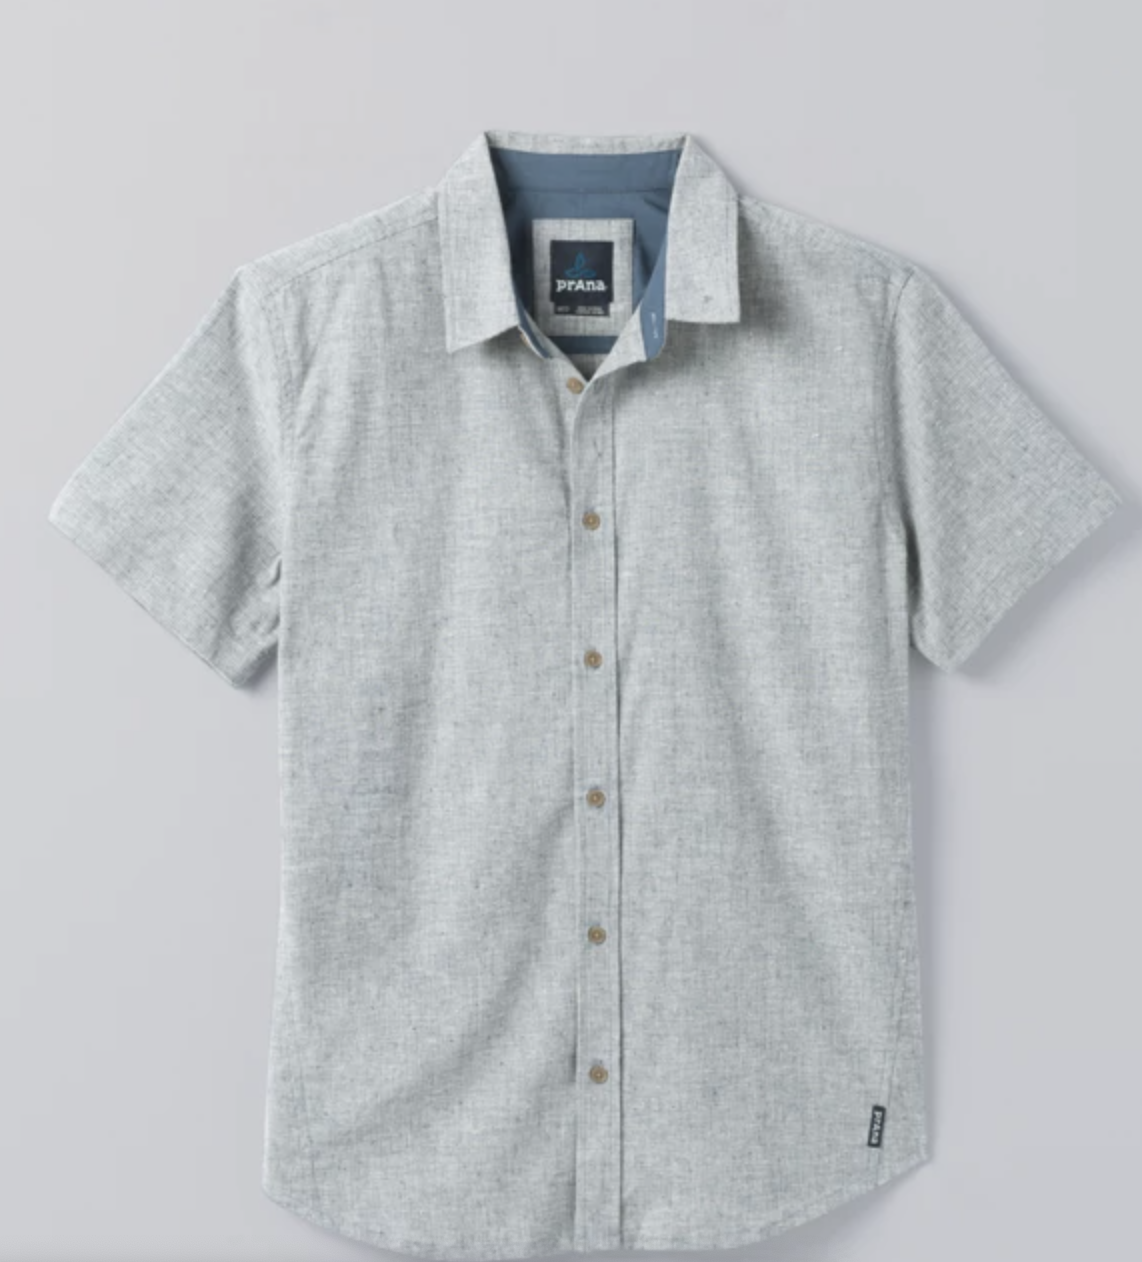 PrAna Grixson Shirt Men's